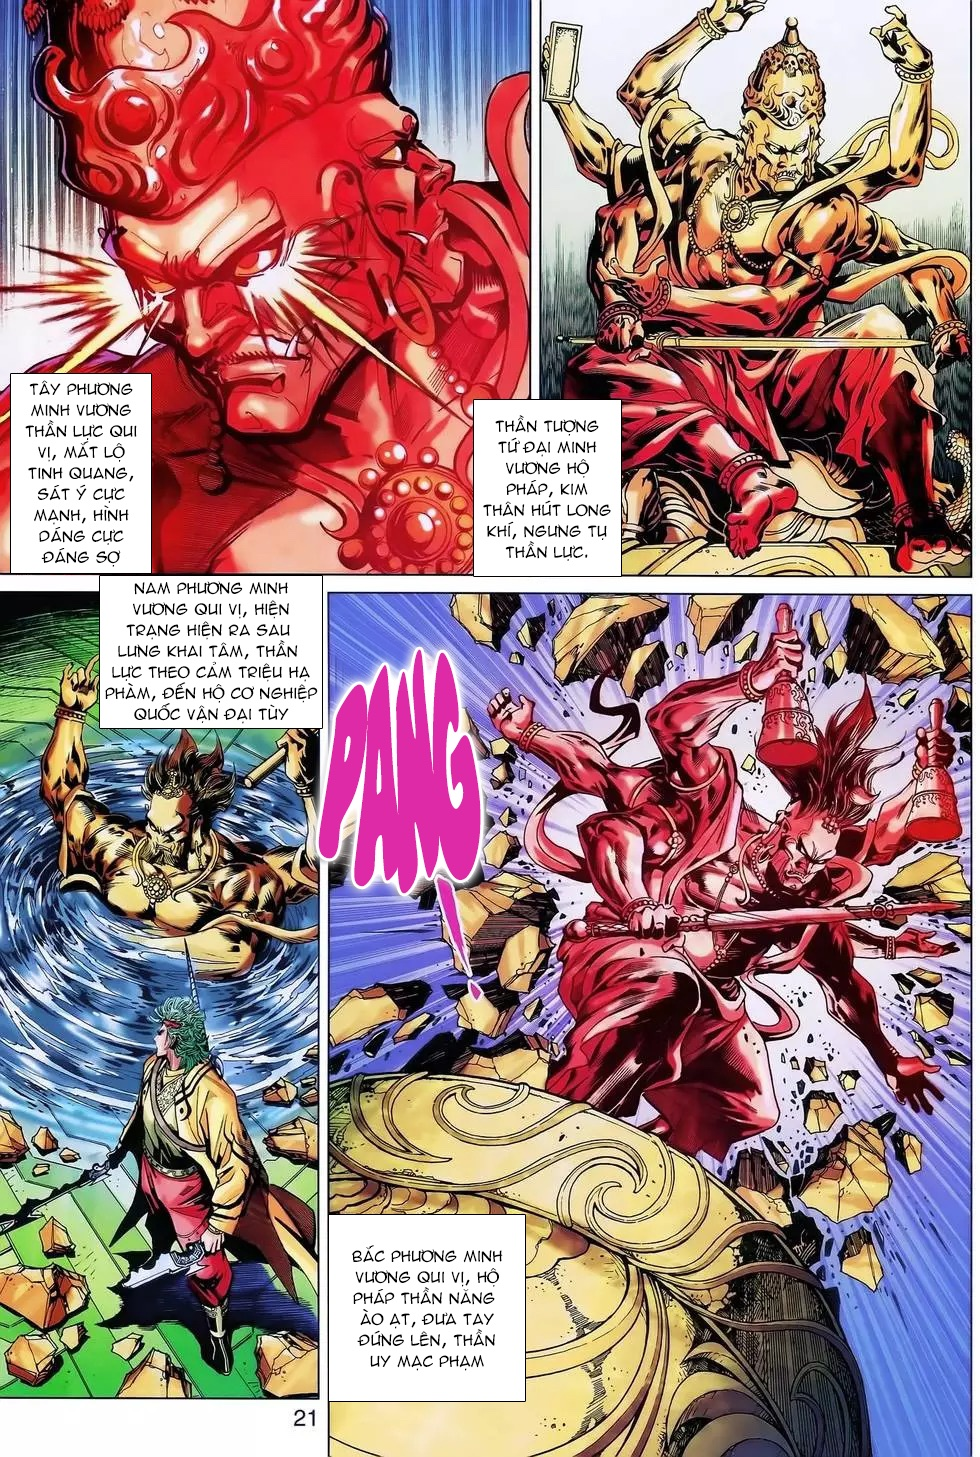 Thần binh huyền kỳ 3 - 3.5 Chapter 174b - Hamtruyen.vn